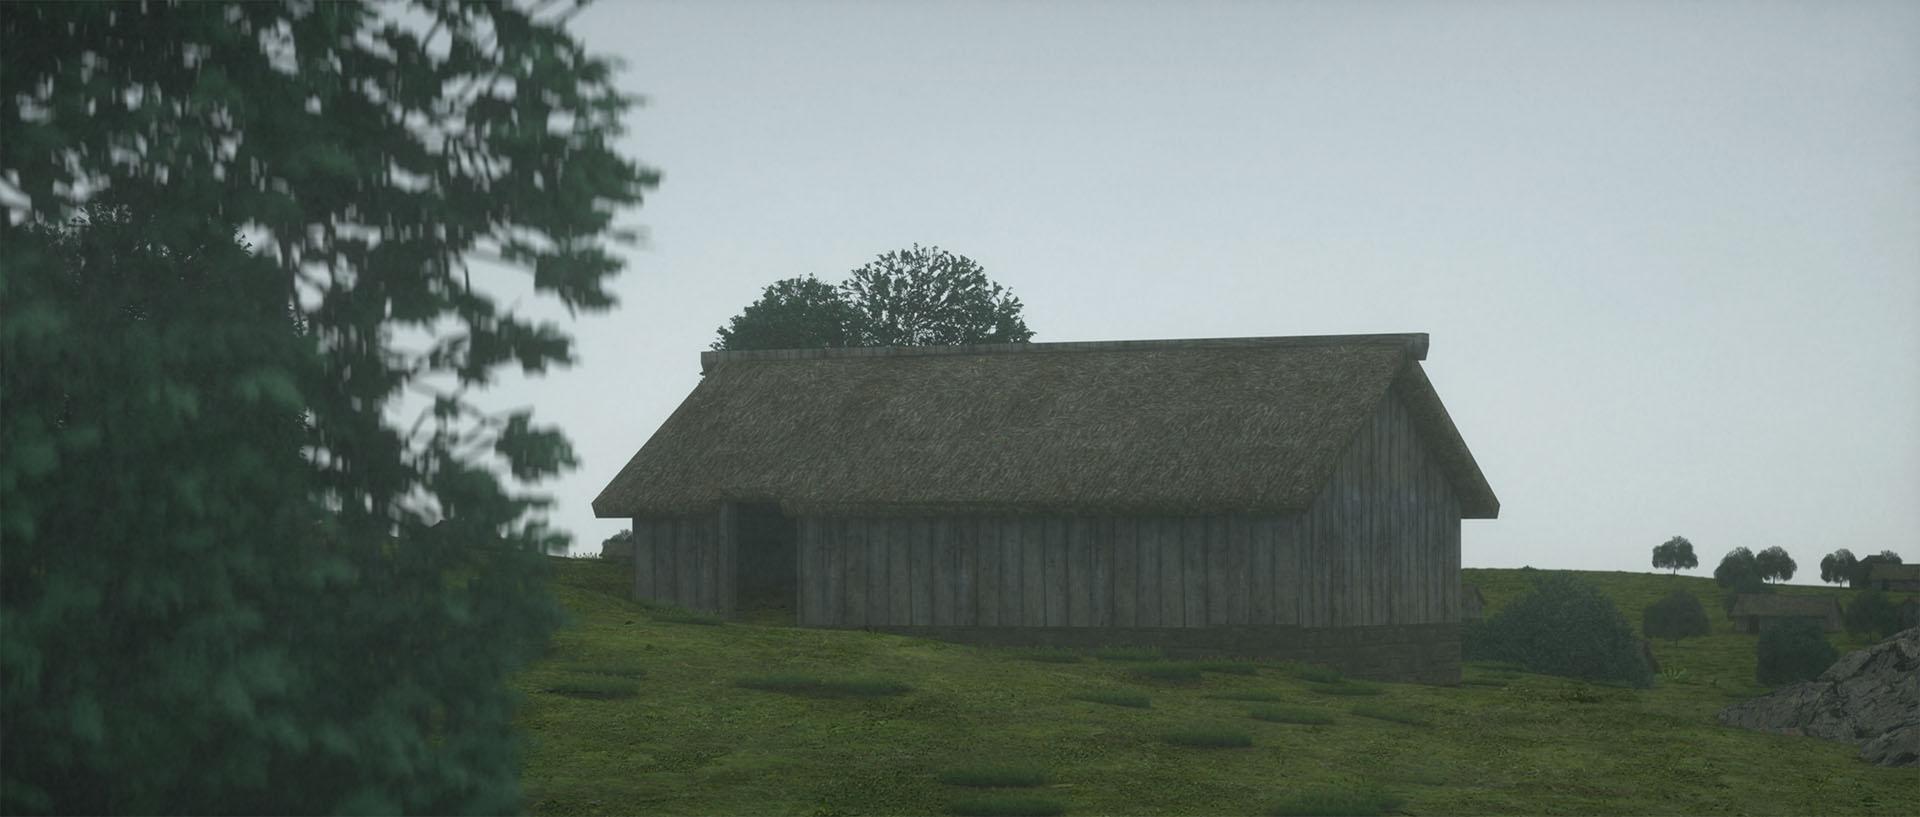 181029 Farmlands1.jpg